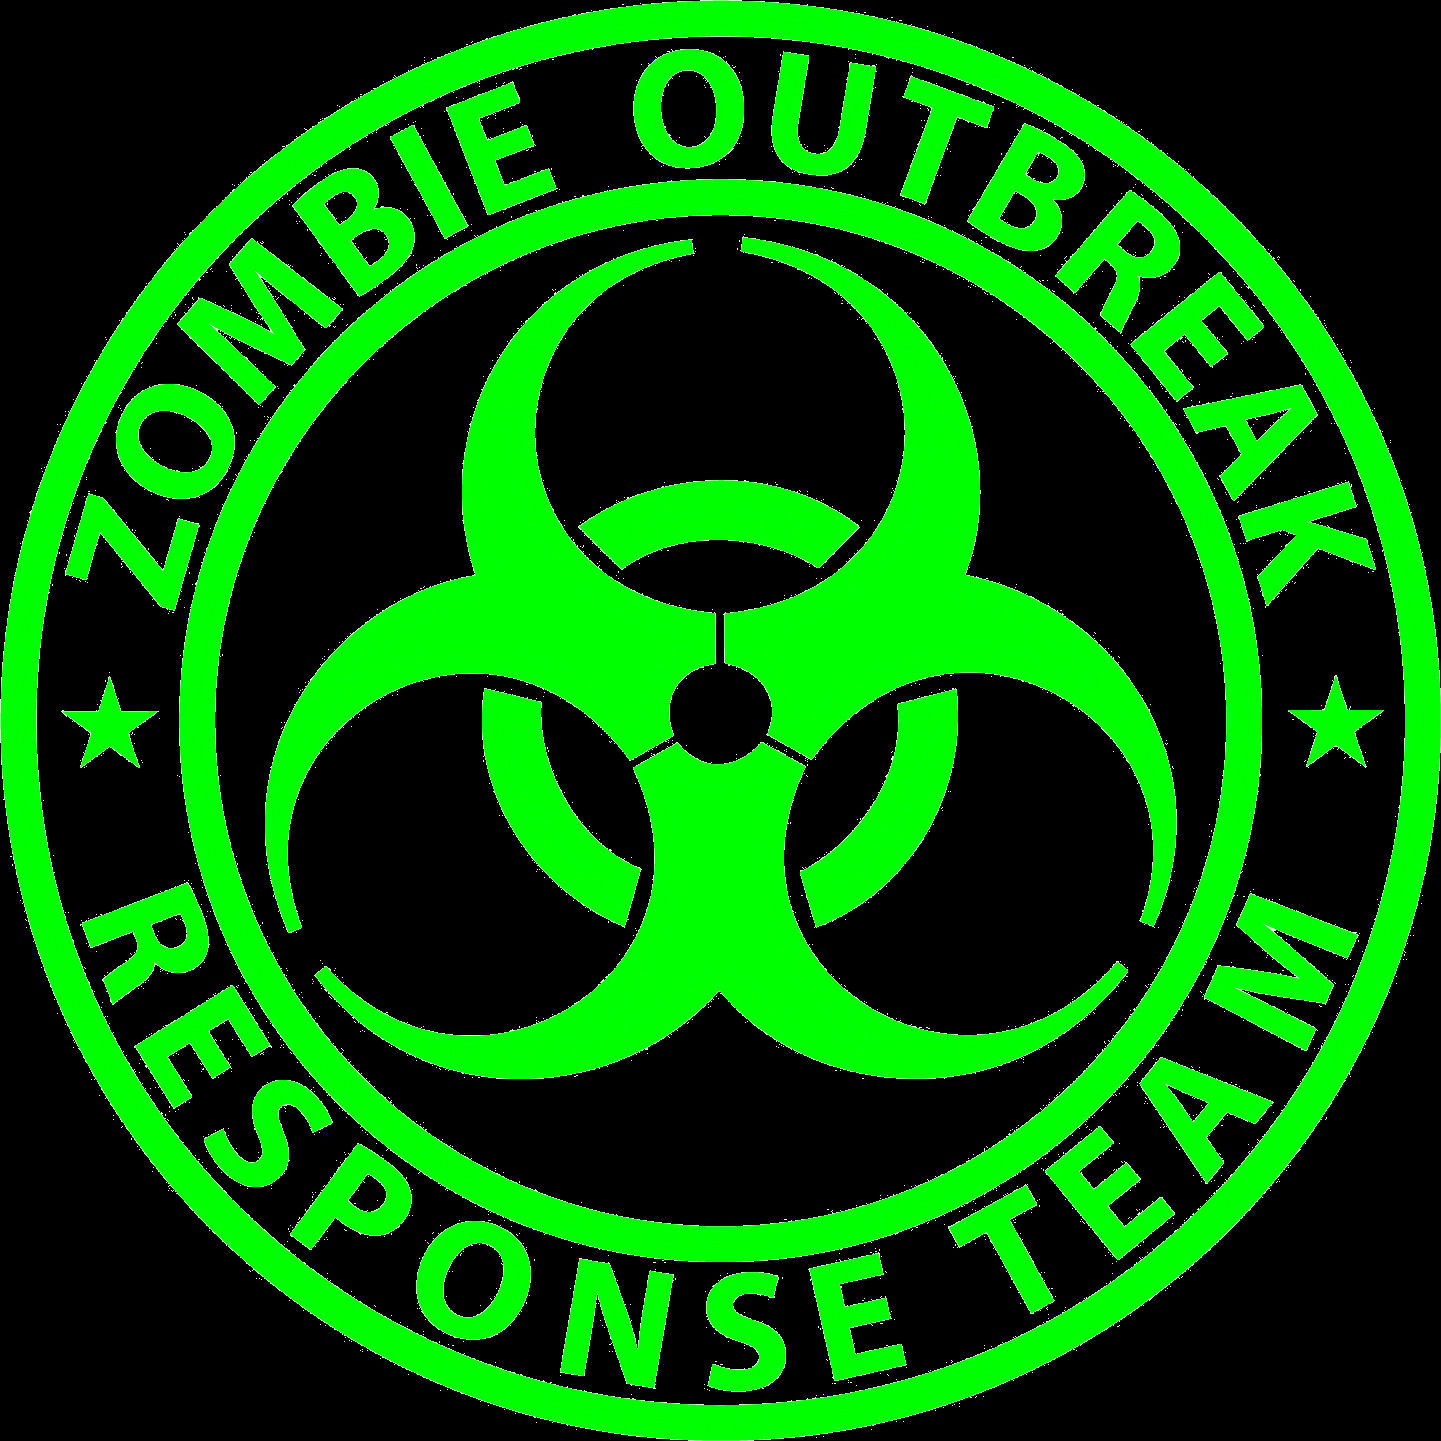 Zombie clipart green Free Brake Green Zombie Green